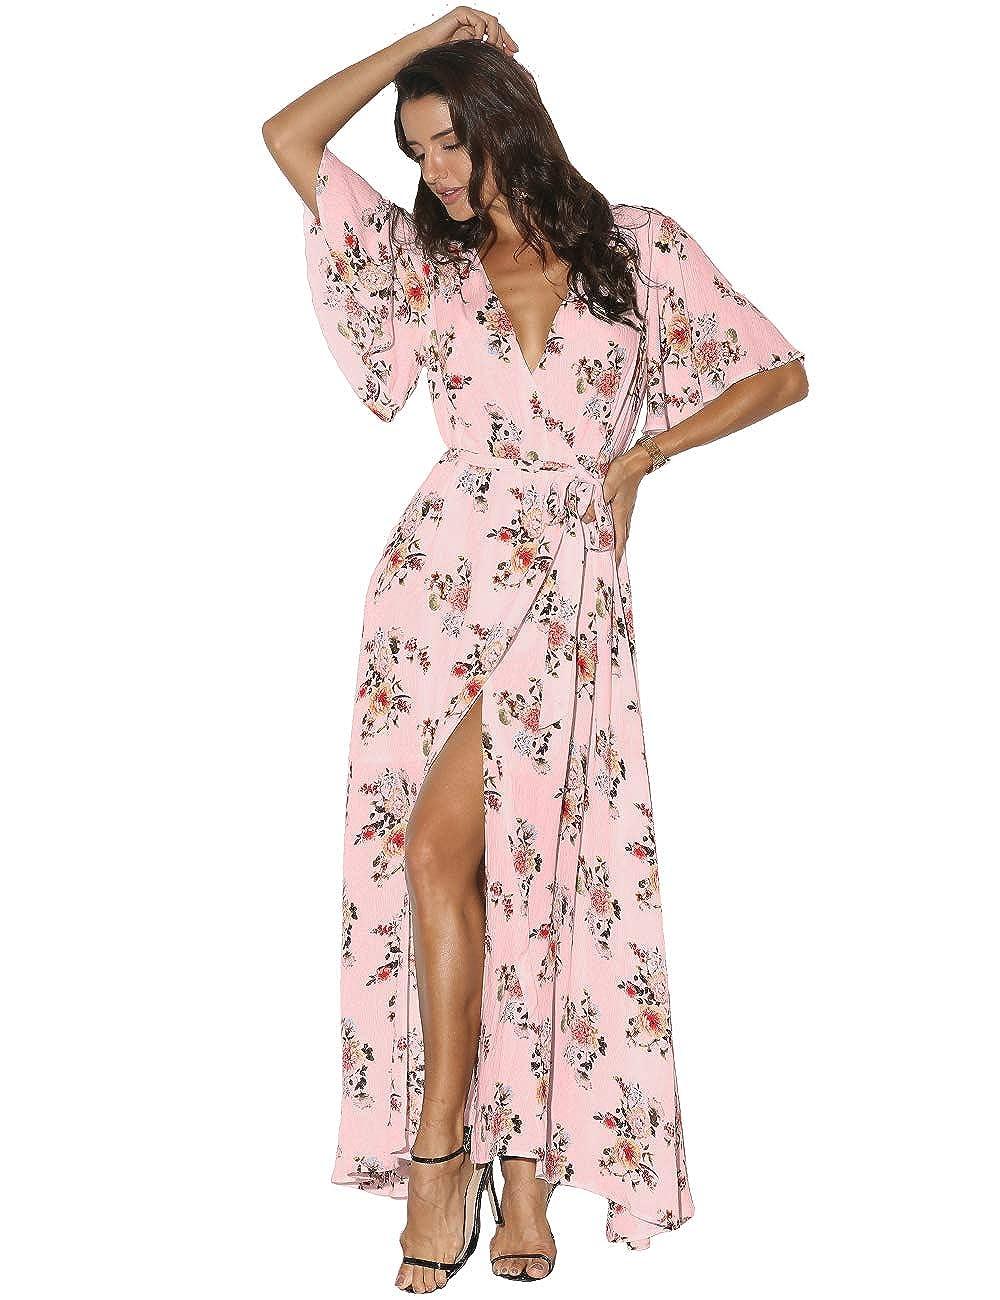 1ec7ec1caab Azalosie Women Wrap Maxi Dress Floral Short Sleeve Flowy Slit Tie Waist  Summer Beach Party Wedding at Amazon Women s Clothing store